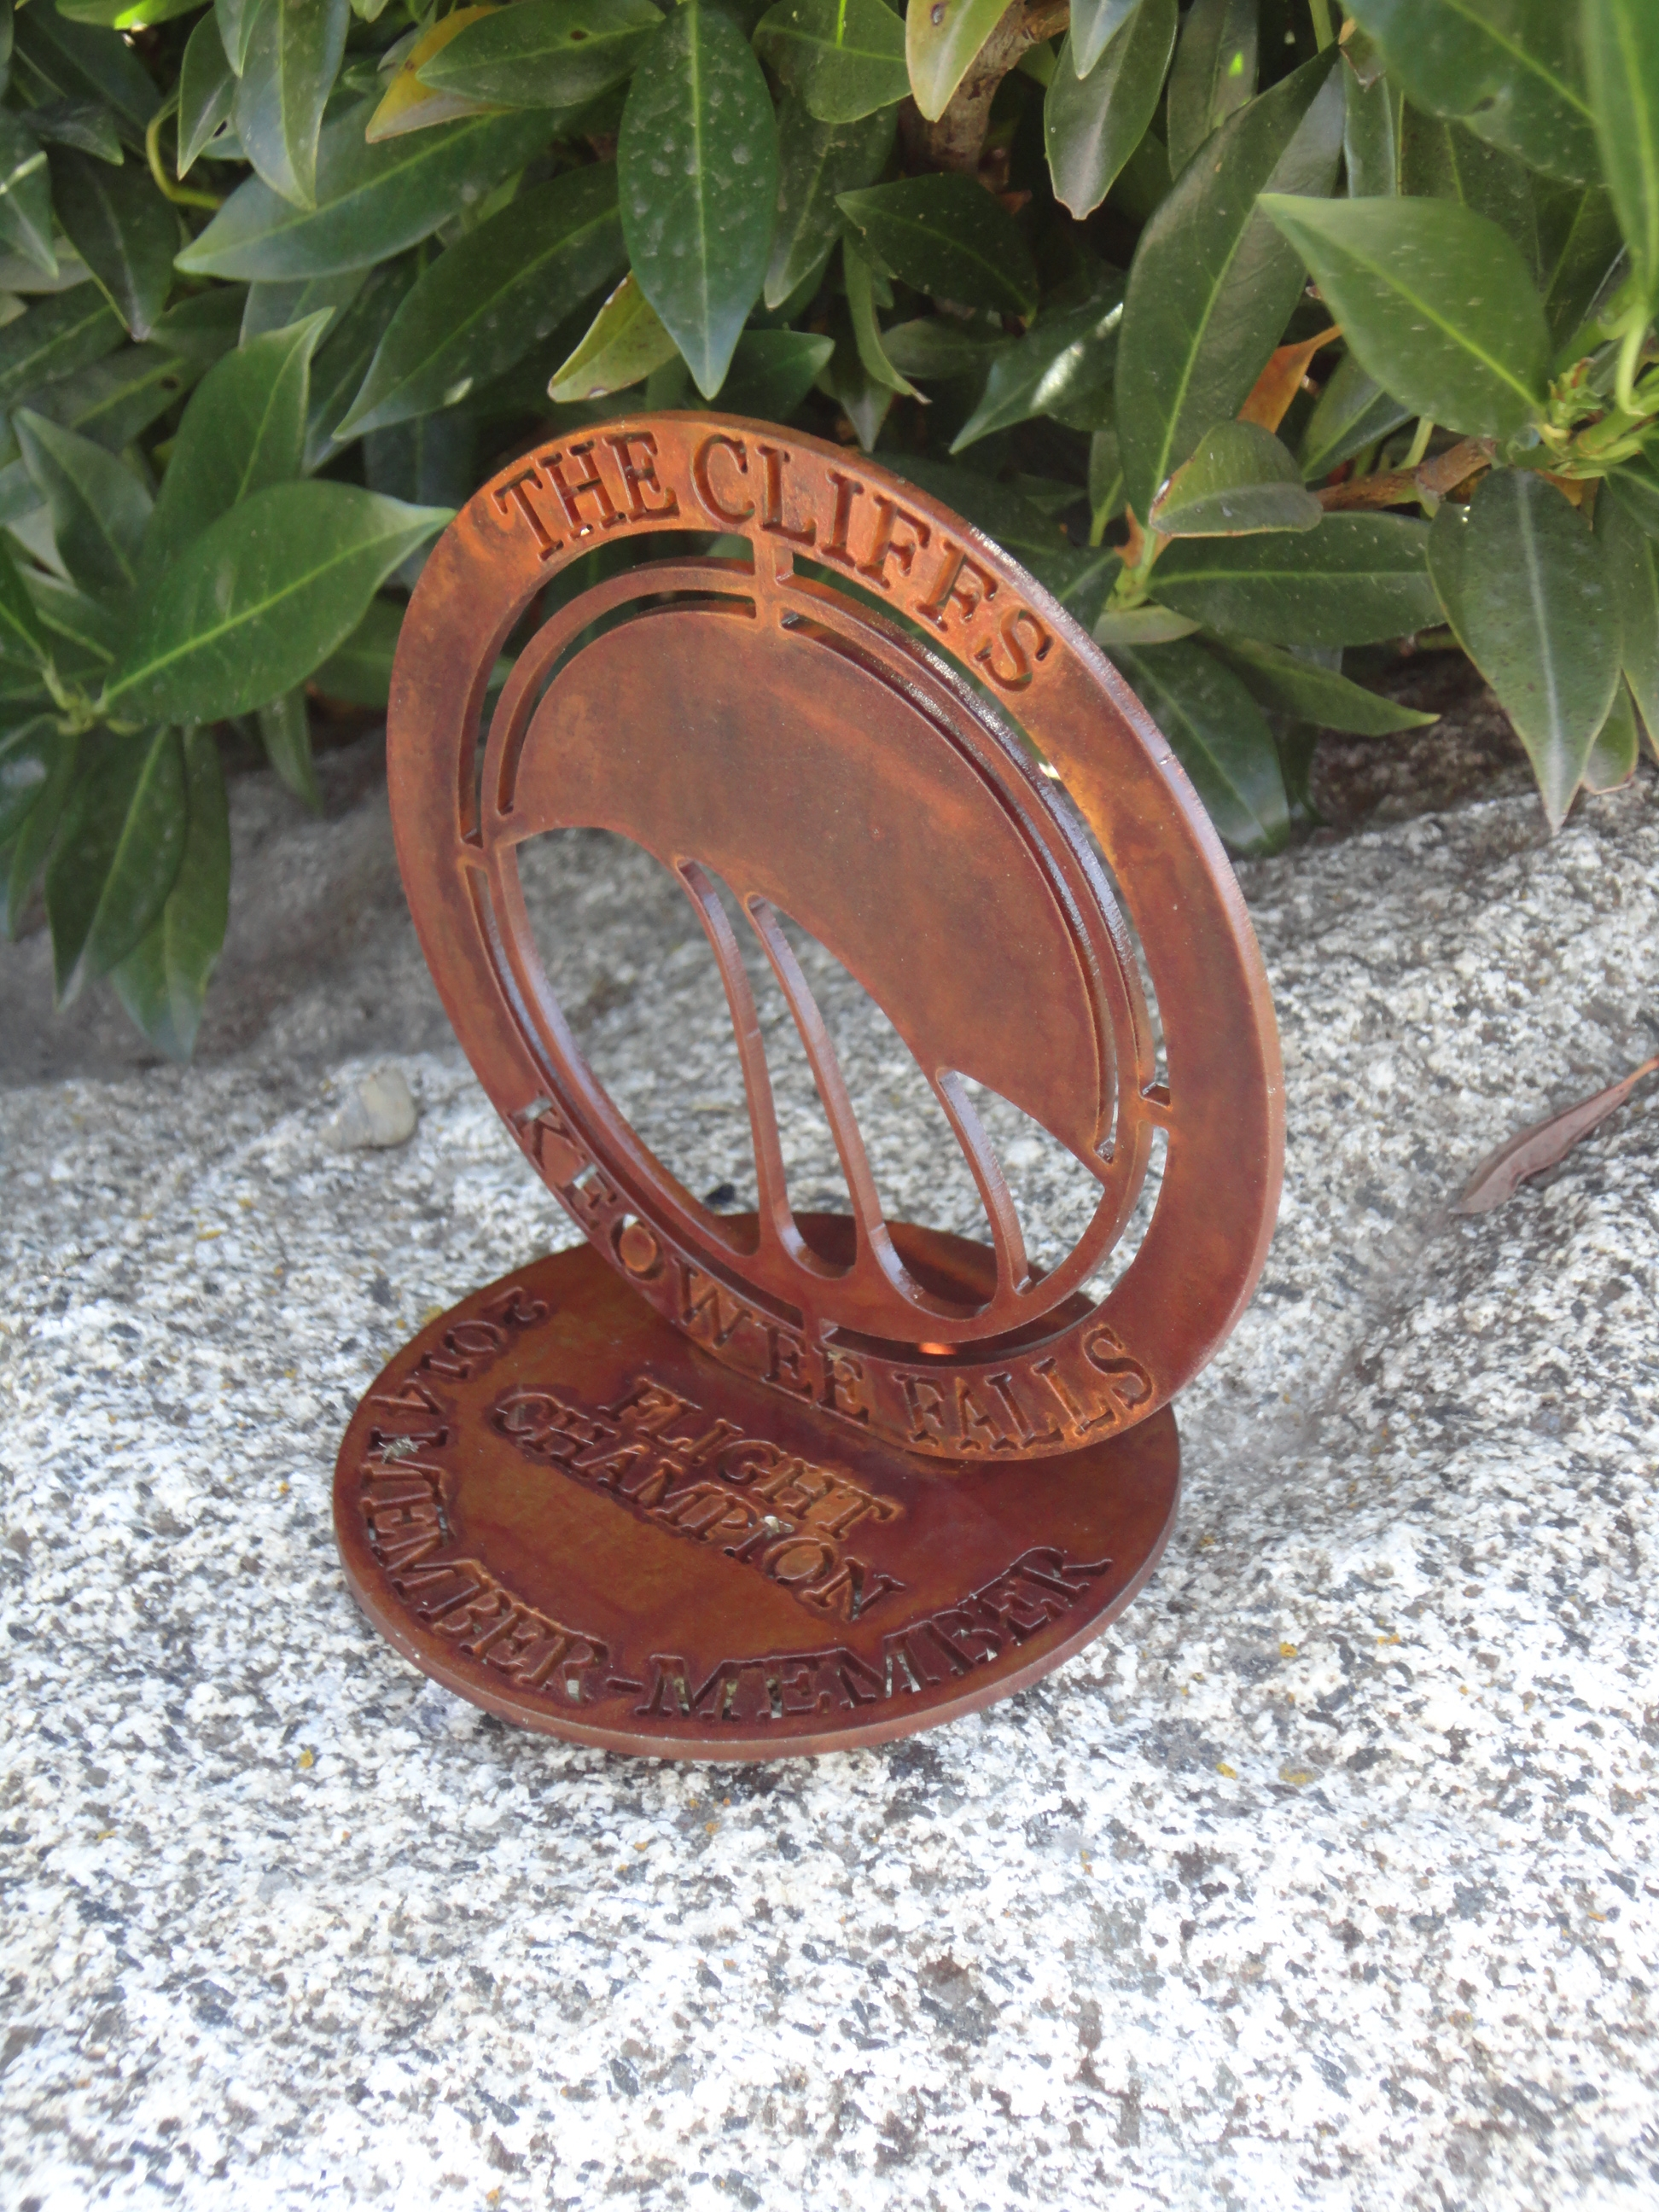 tournament-award-cliffs-keowee-falls